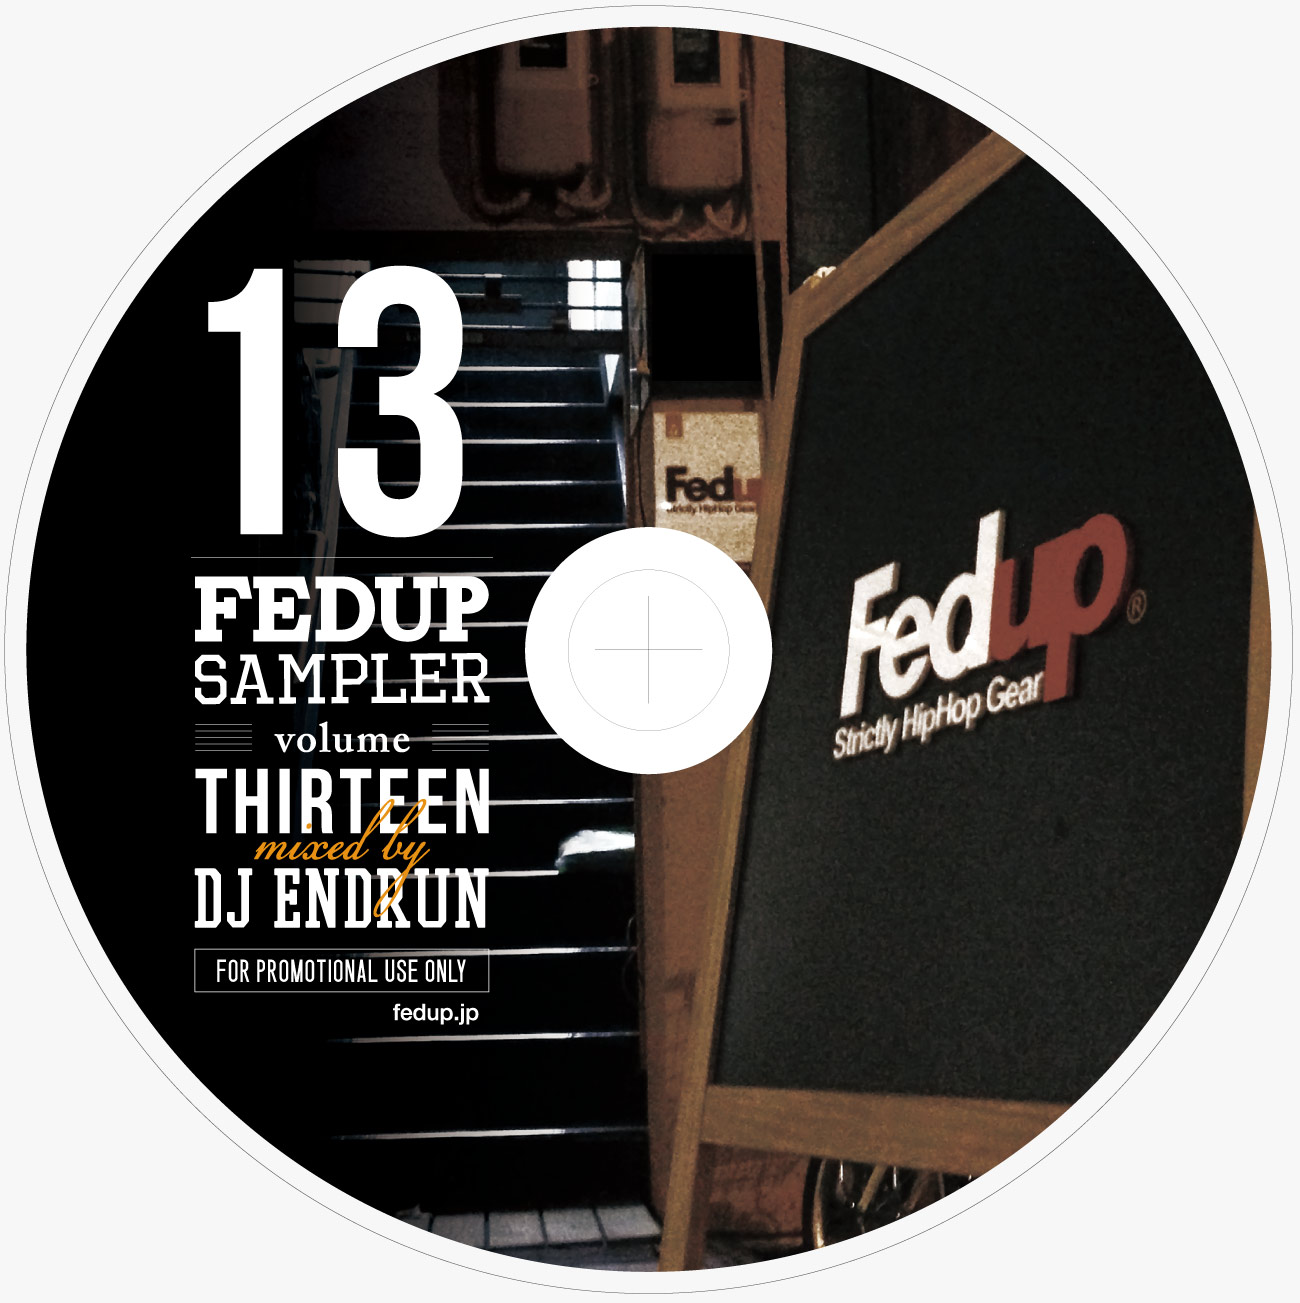 Fedup sampler vol.13